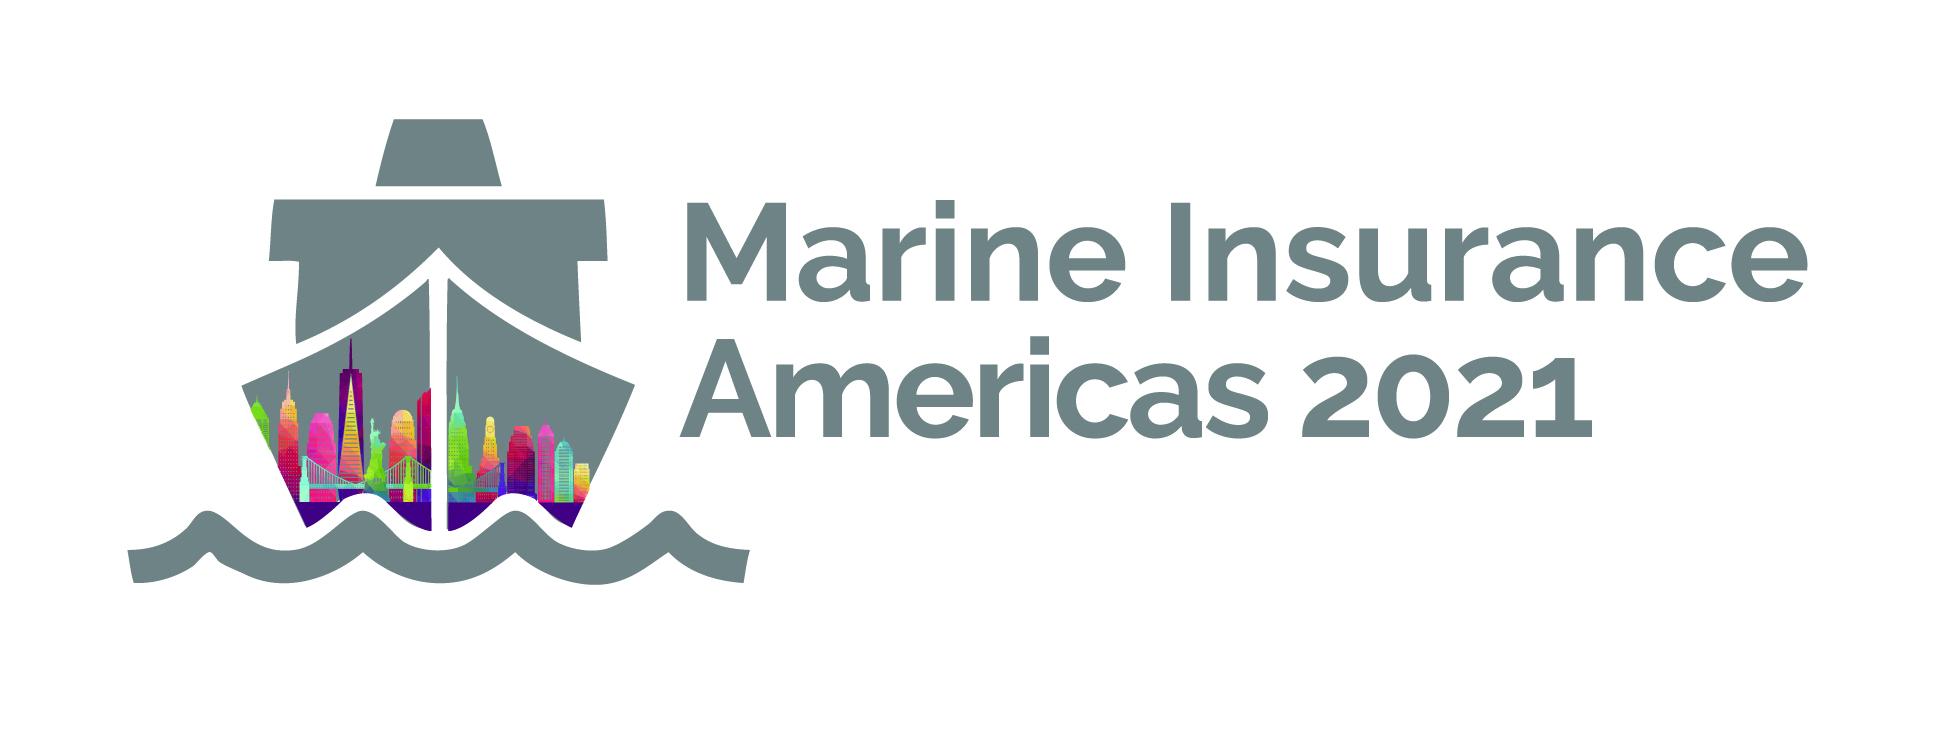 Marine Insurance Americas